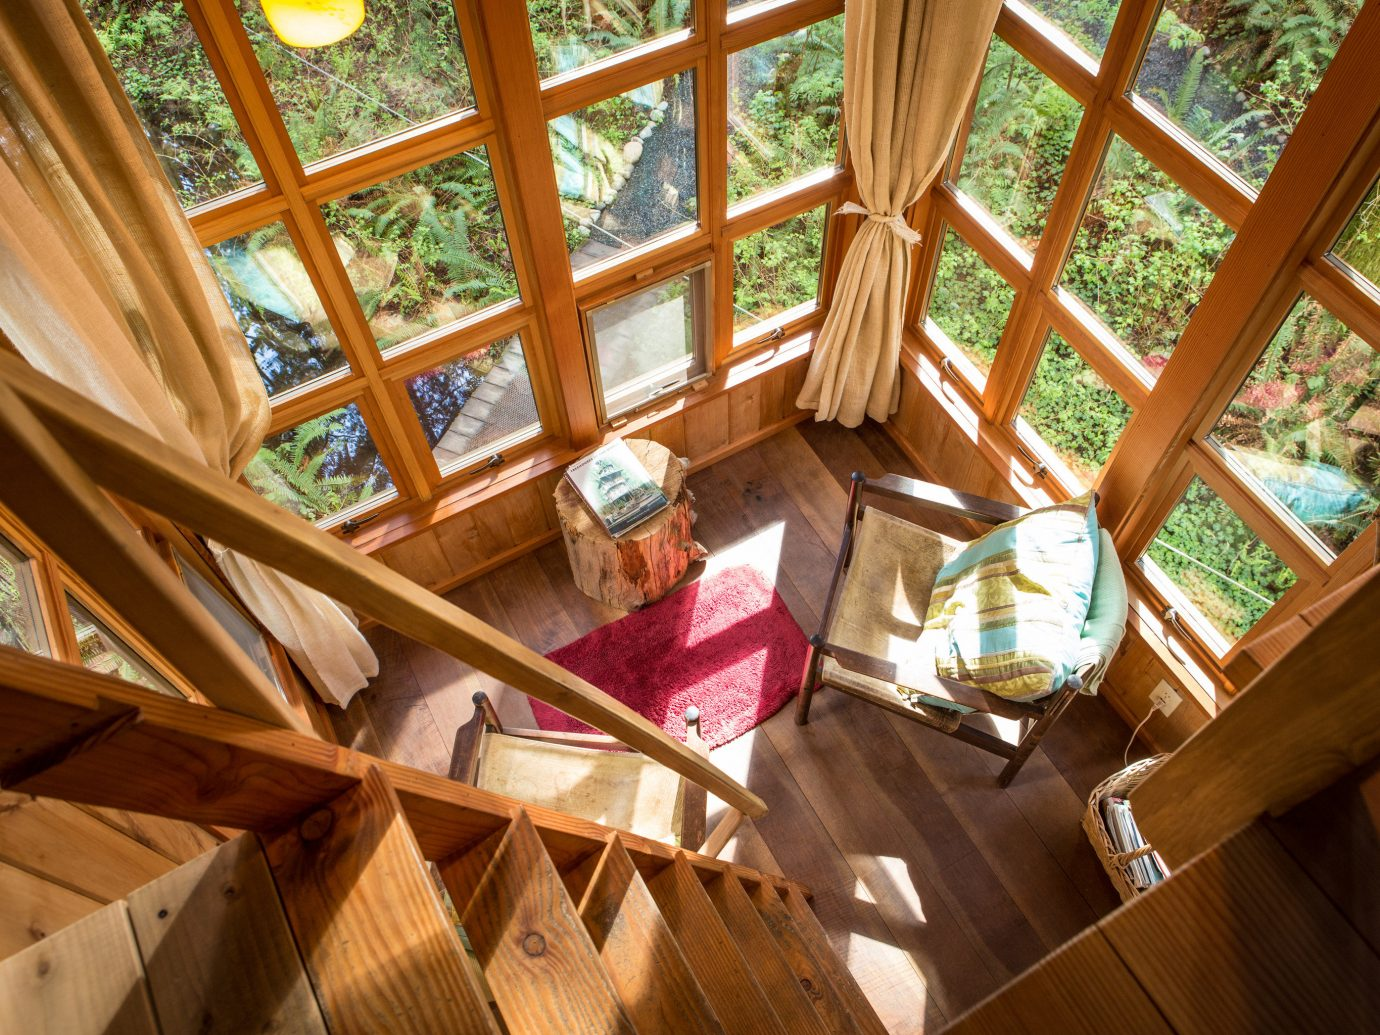 Hotels room house wood home window estate ceiling interior design roof cottage